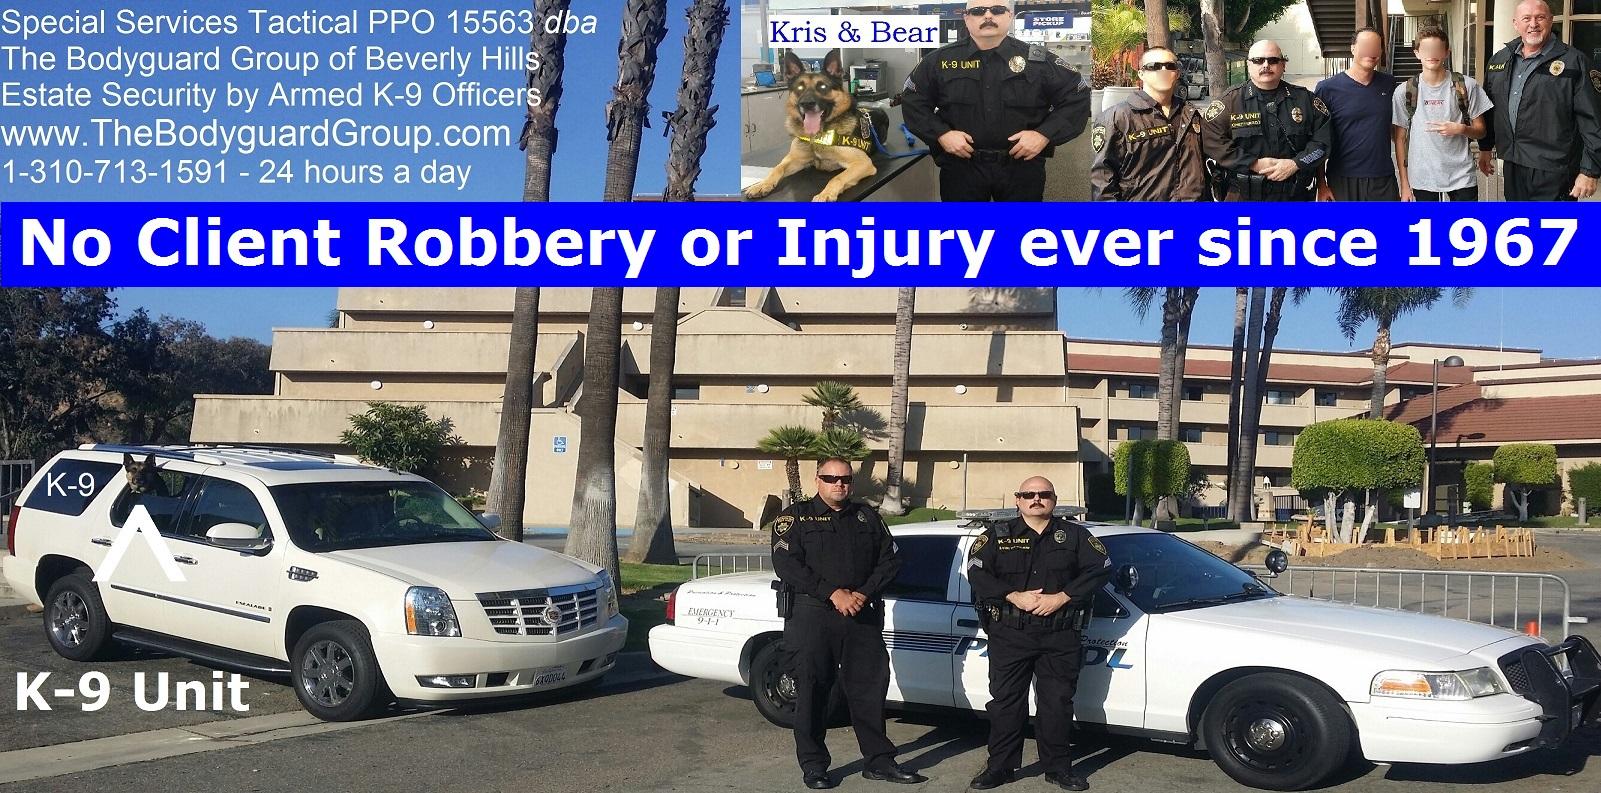 Liams Security Guard 90210